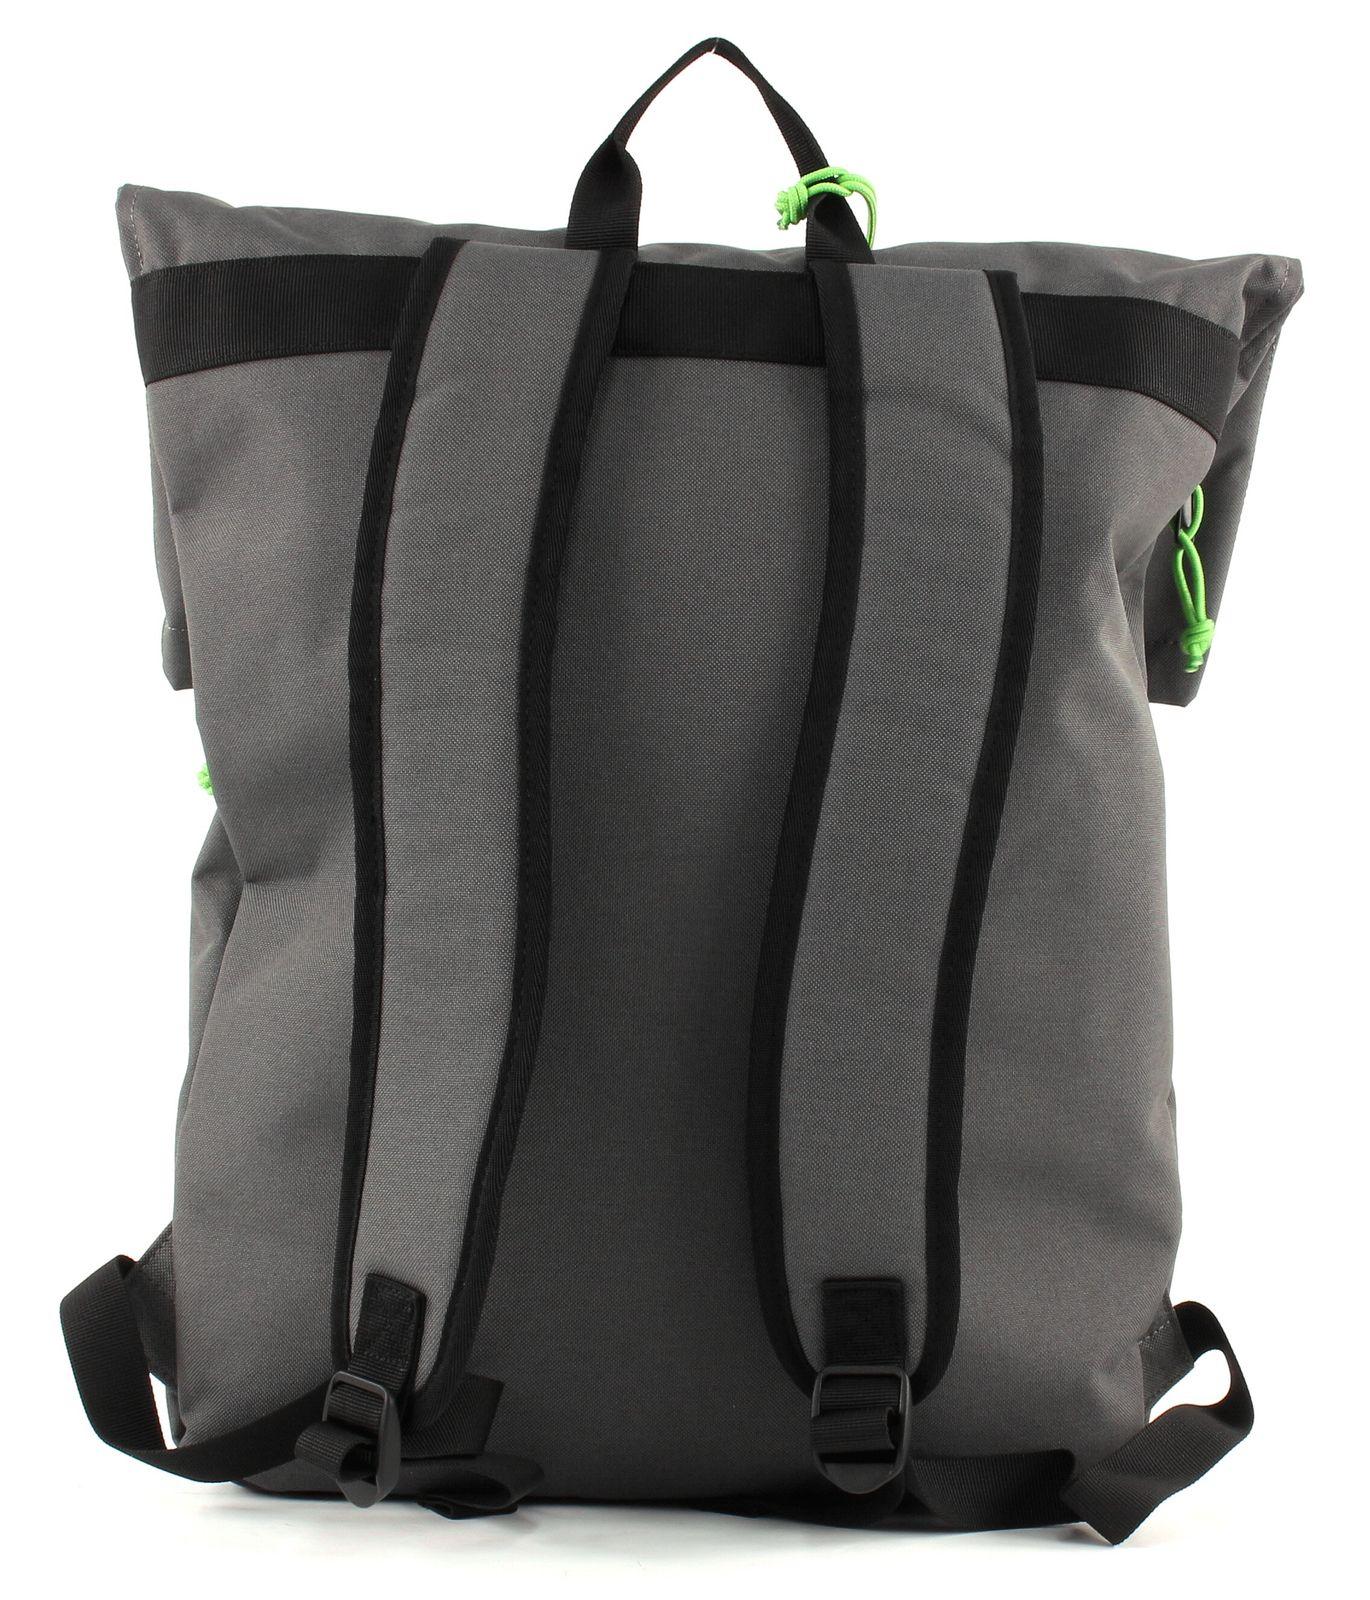 bree punch 93 backpack w17 m rucksack freizeitrucksack. Black Bedroom Furniture Sets. Home Design Ideas